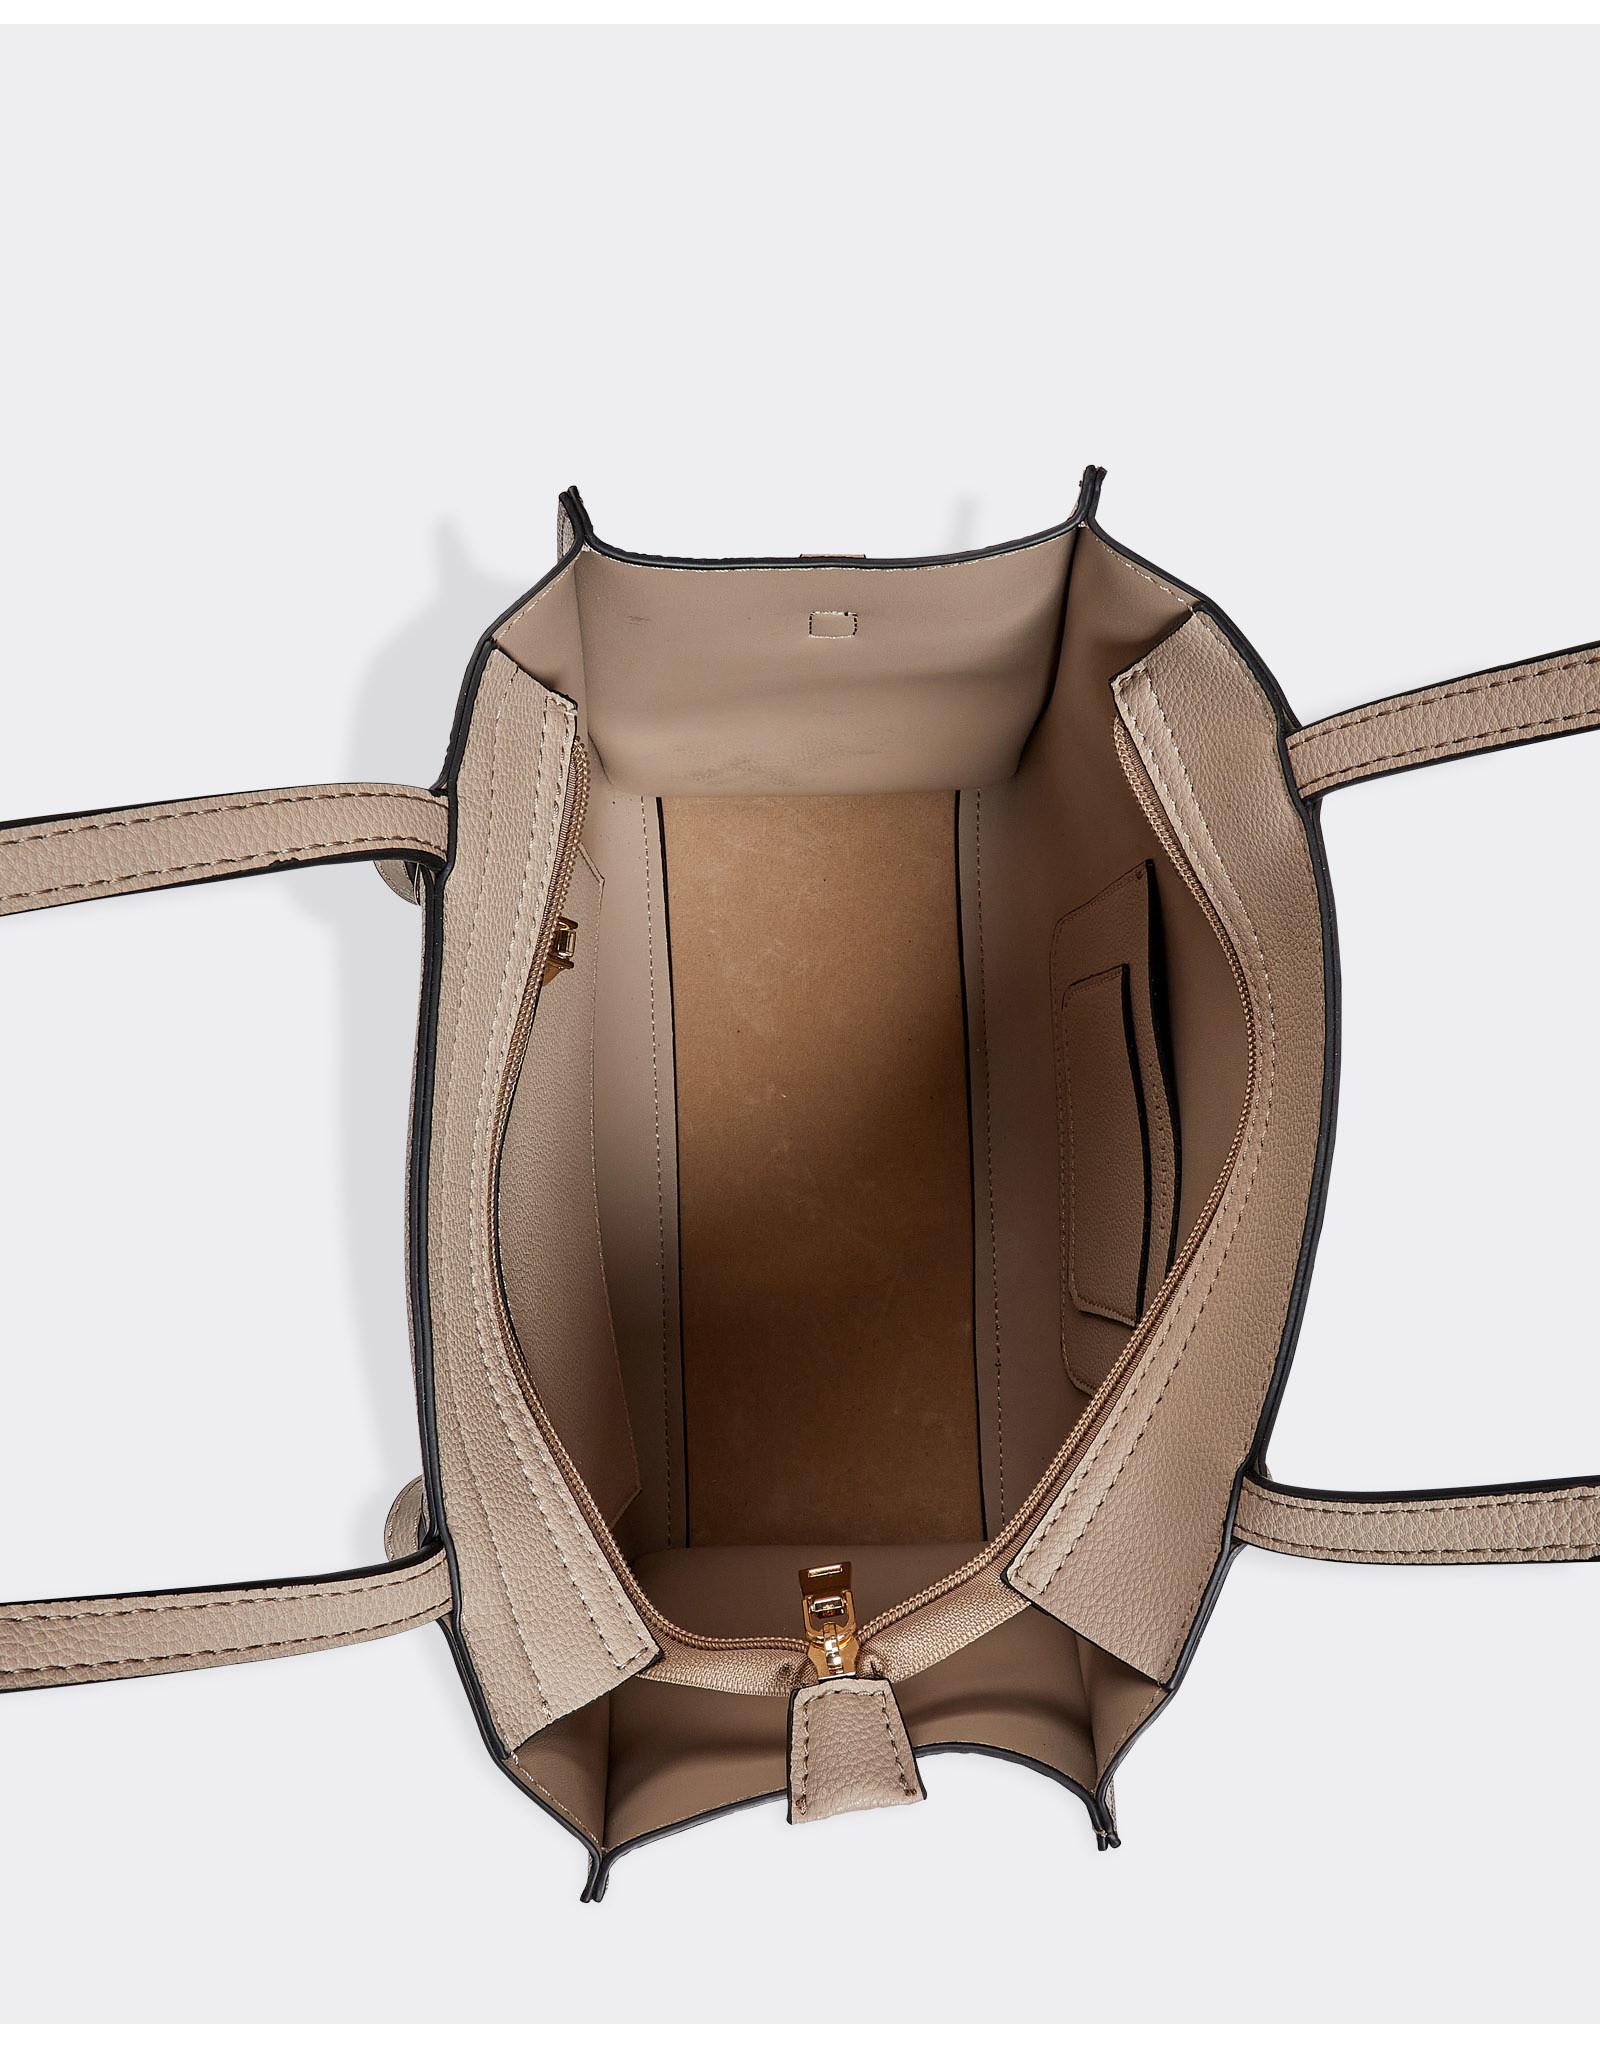 Louenhide Louenhide Knox Handbag